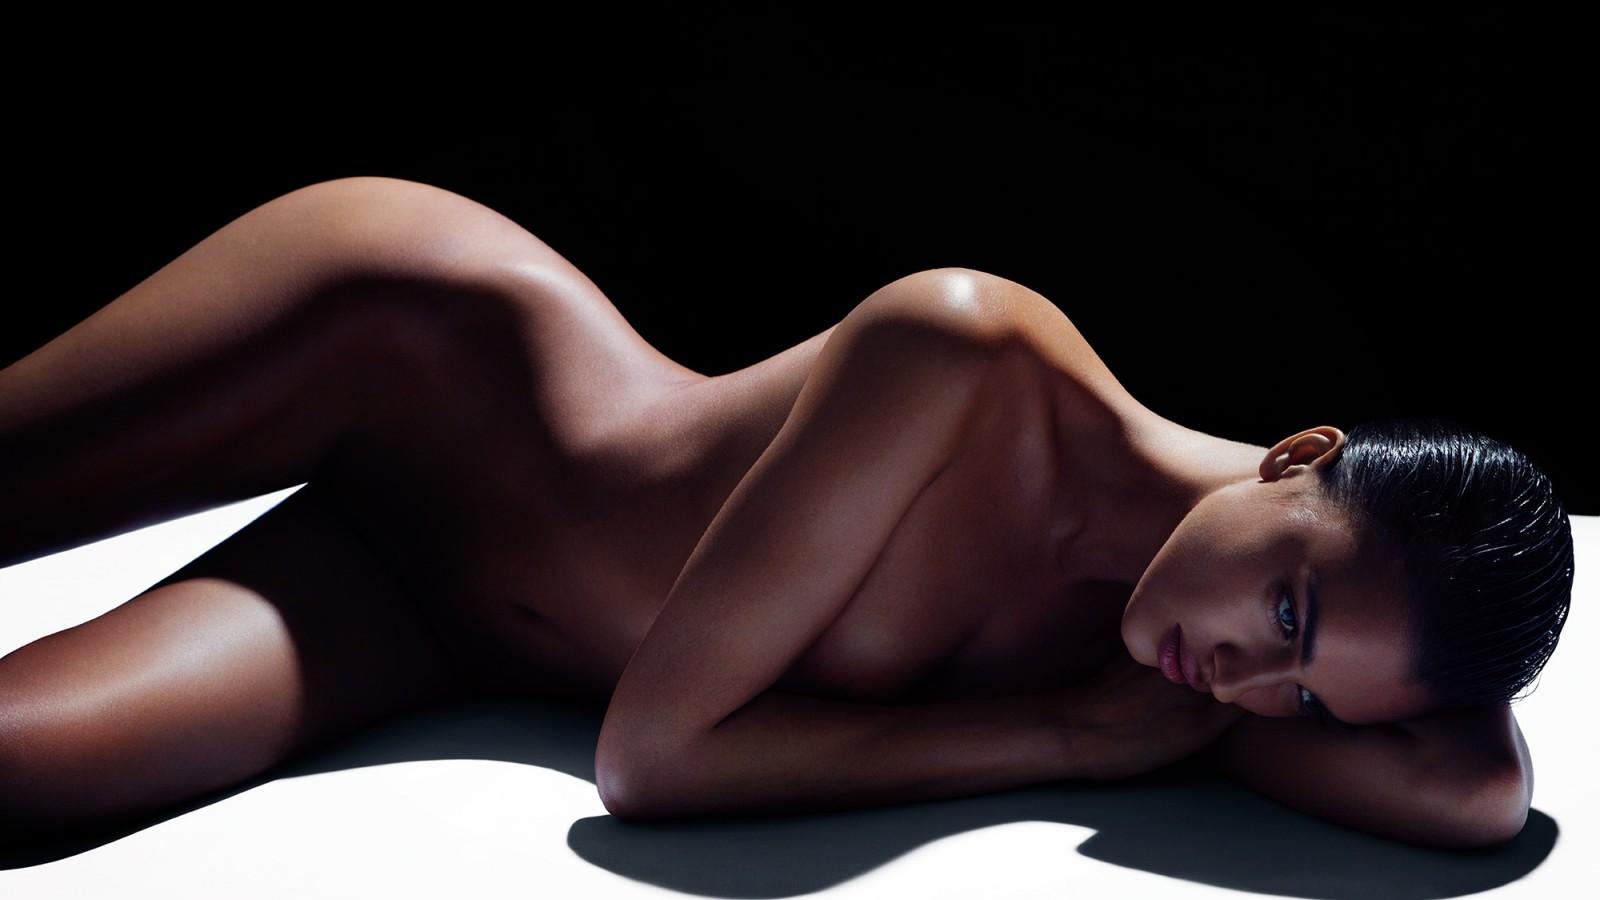 Ирина Шейк, Irina Shayk, девушка, модель, красотка, актри.